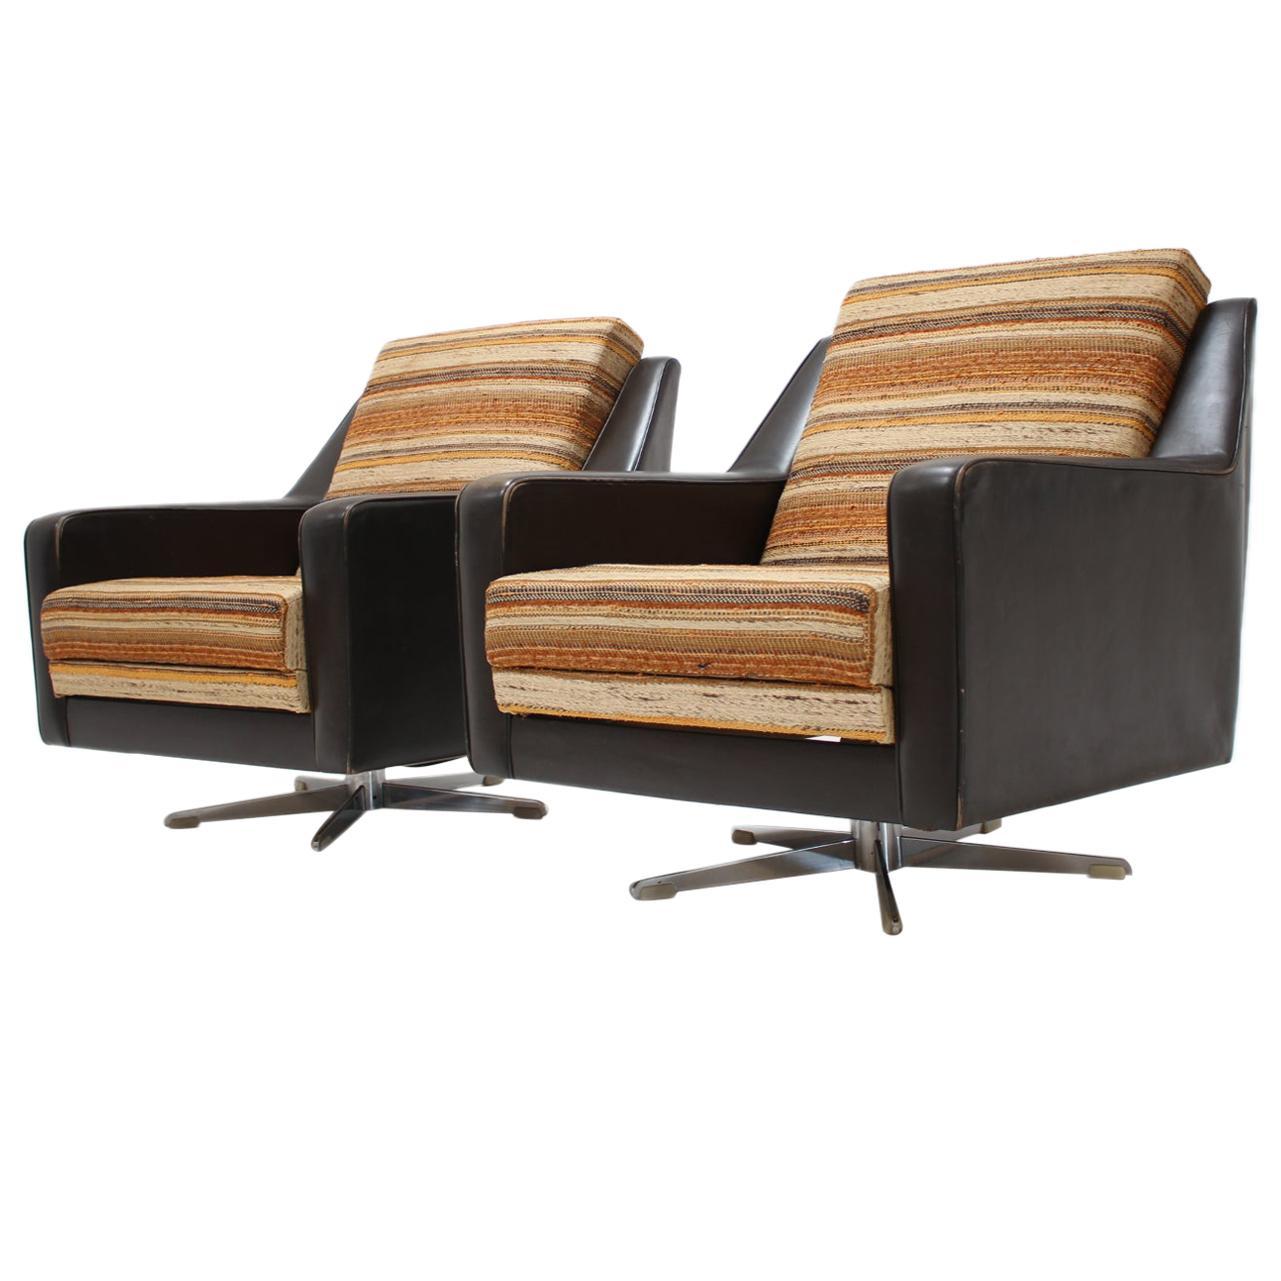 Set of Two Italian Swivel Chairs, 1970s